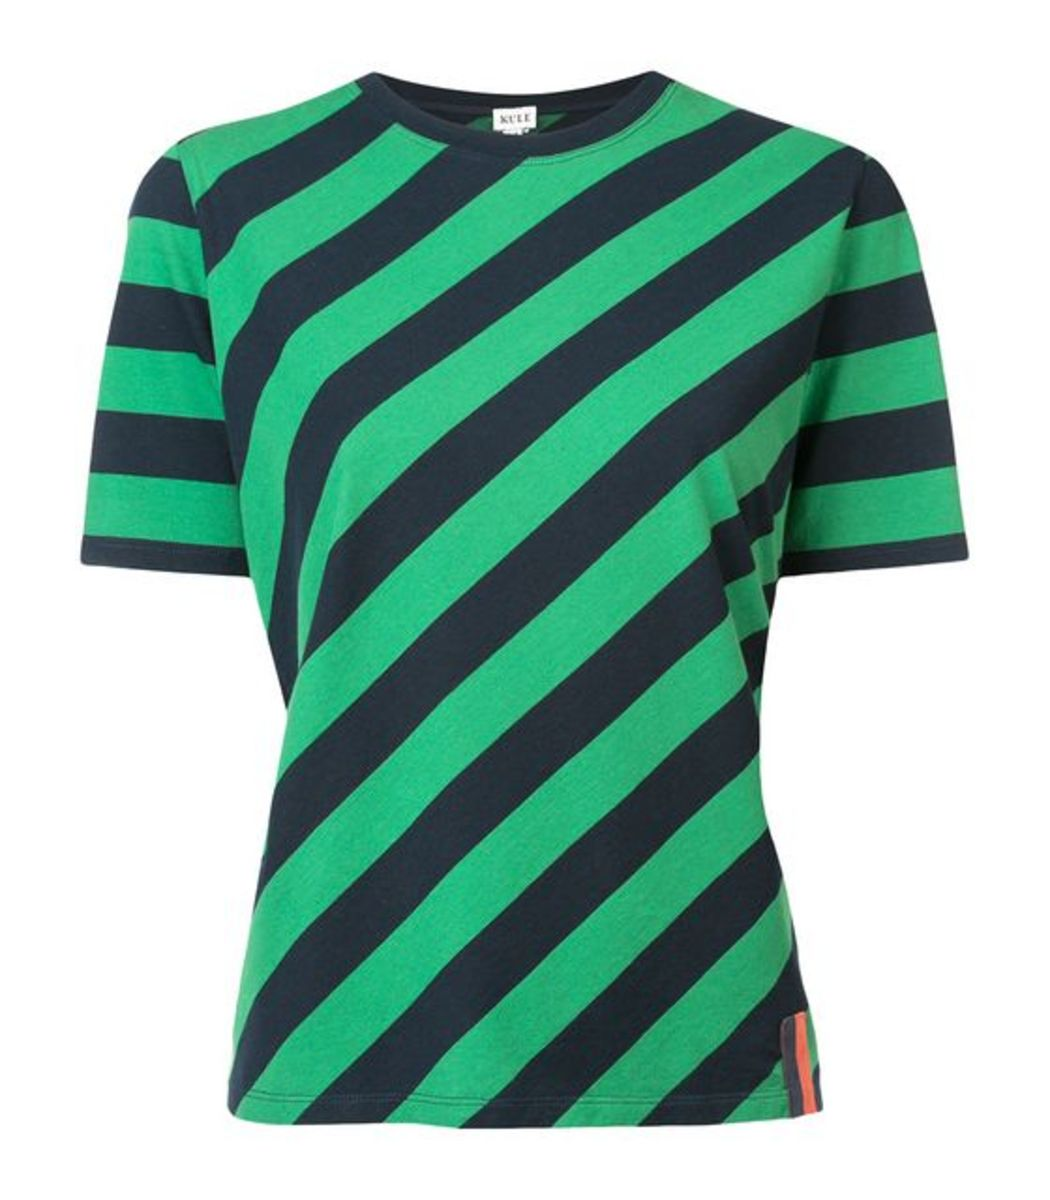 KULE Green/Navy Striped T-Shirt